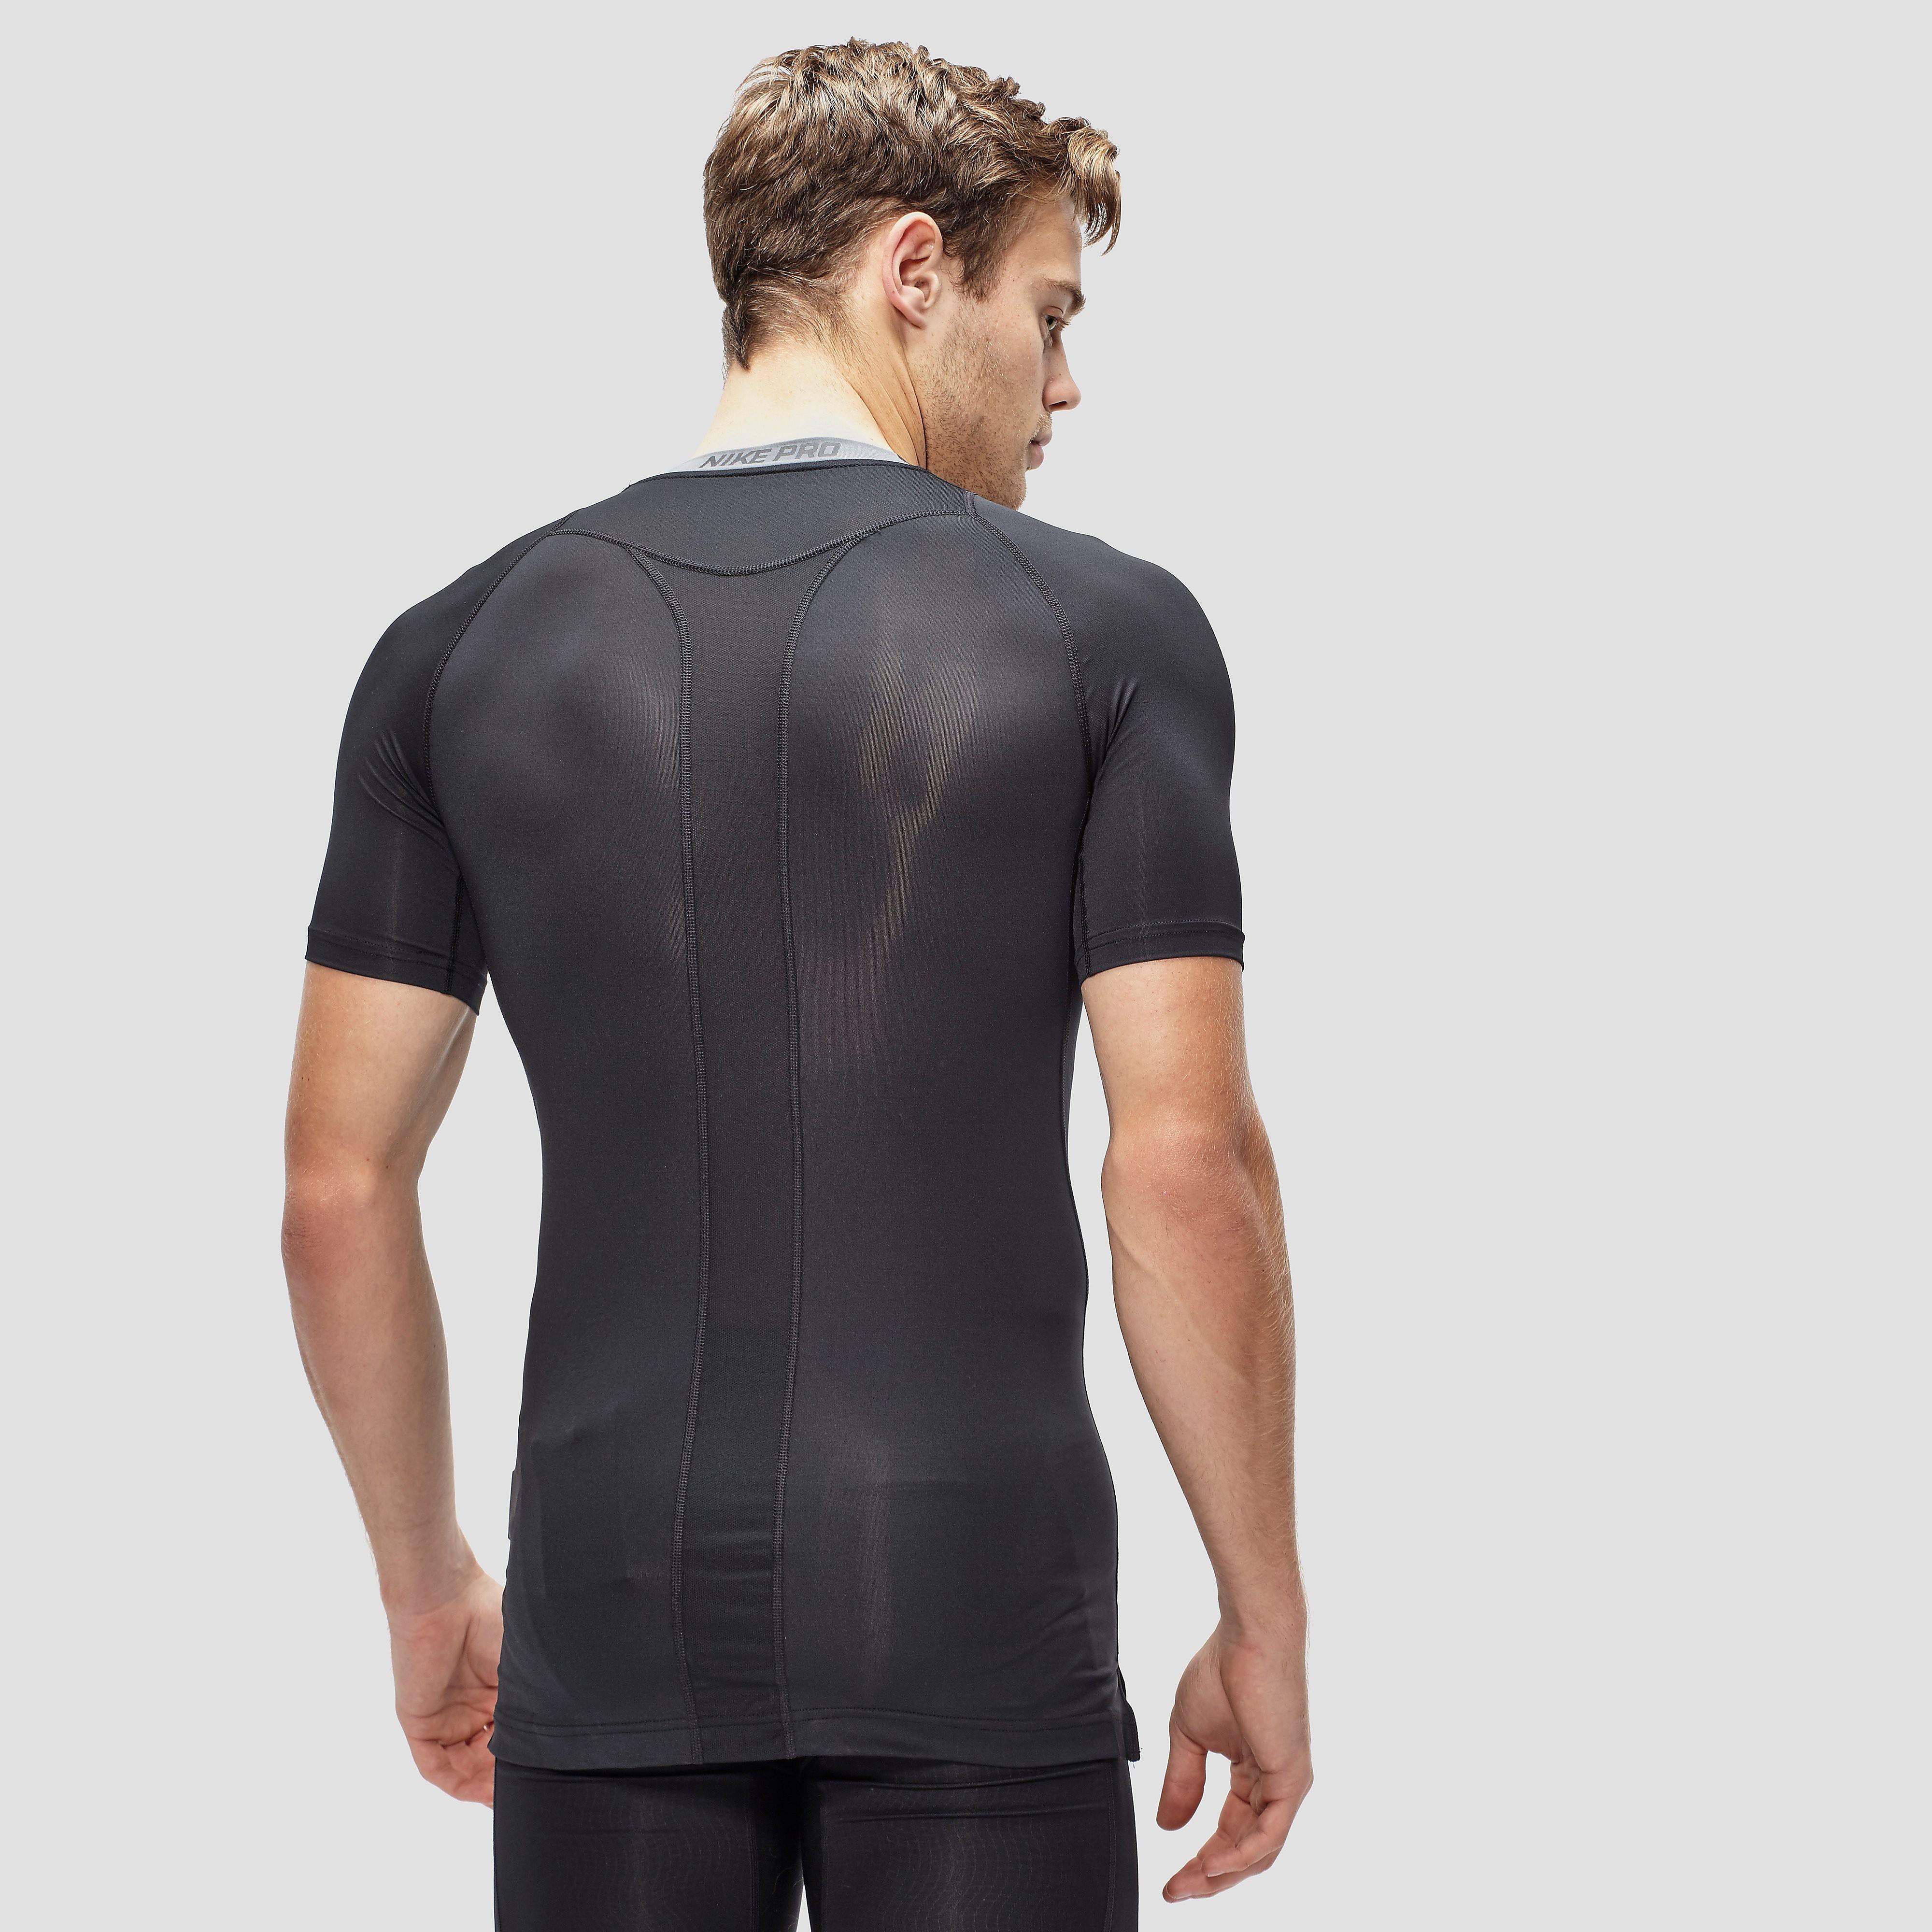 Nike Men's Pro Cool Compression Short-Sleeve Shirt